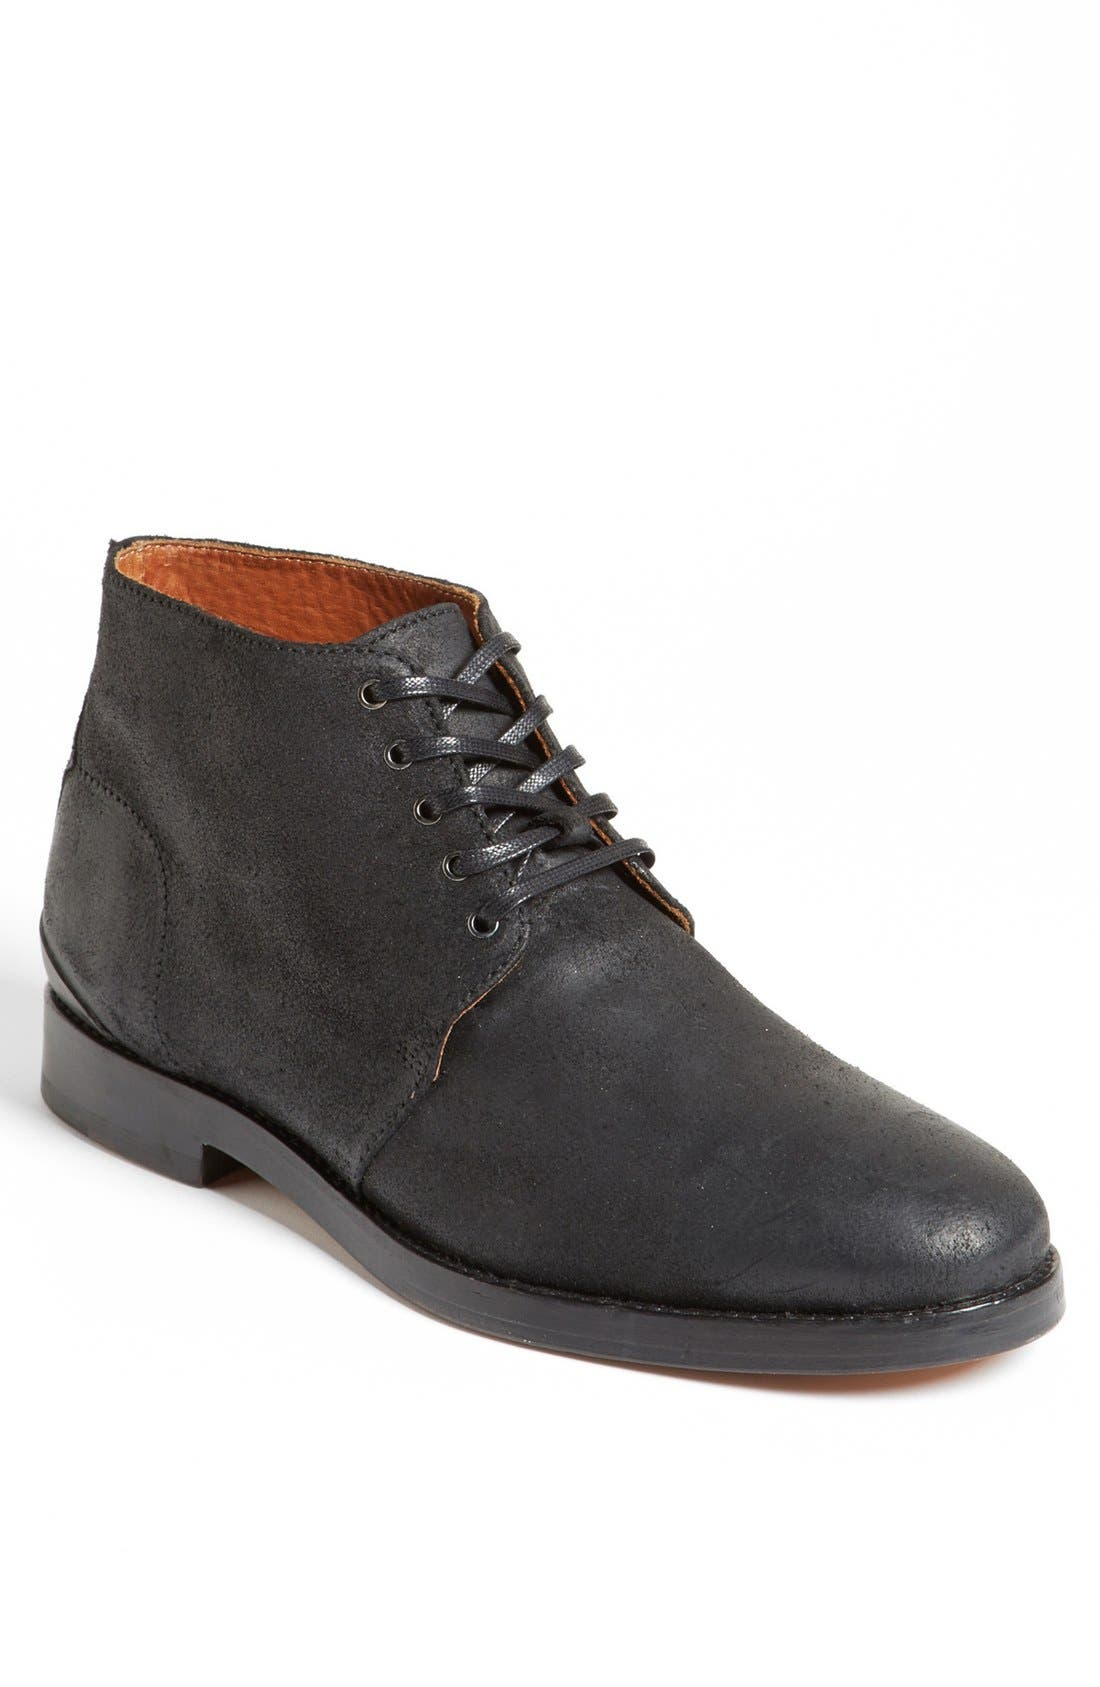 Main Image - rag & bone 'Archer' Plain Toe Suede Boot